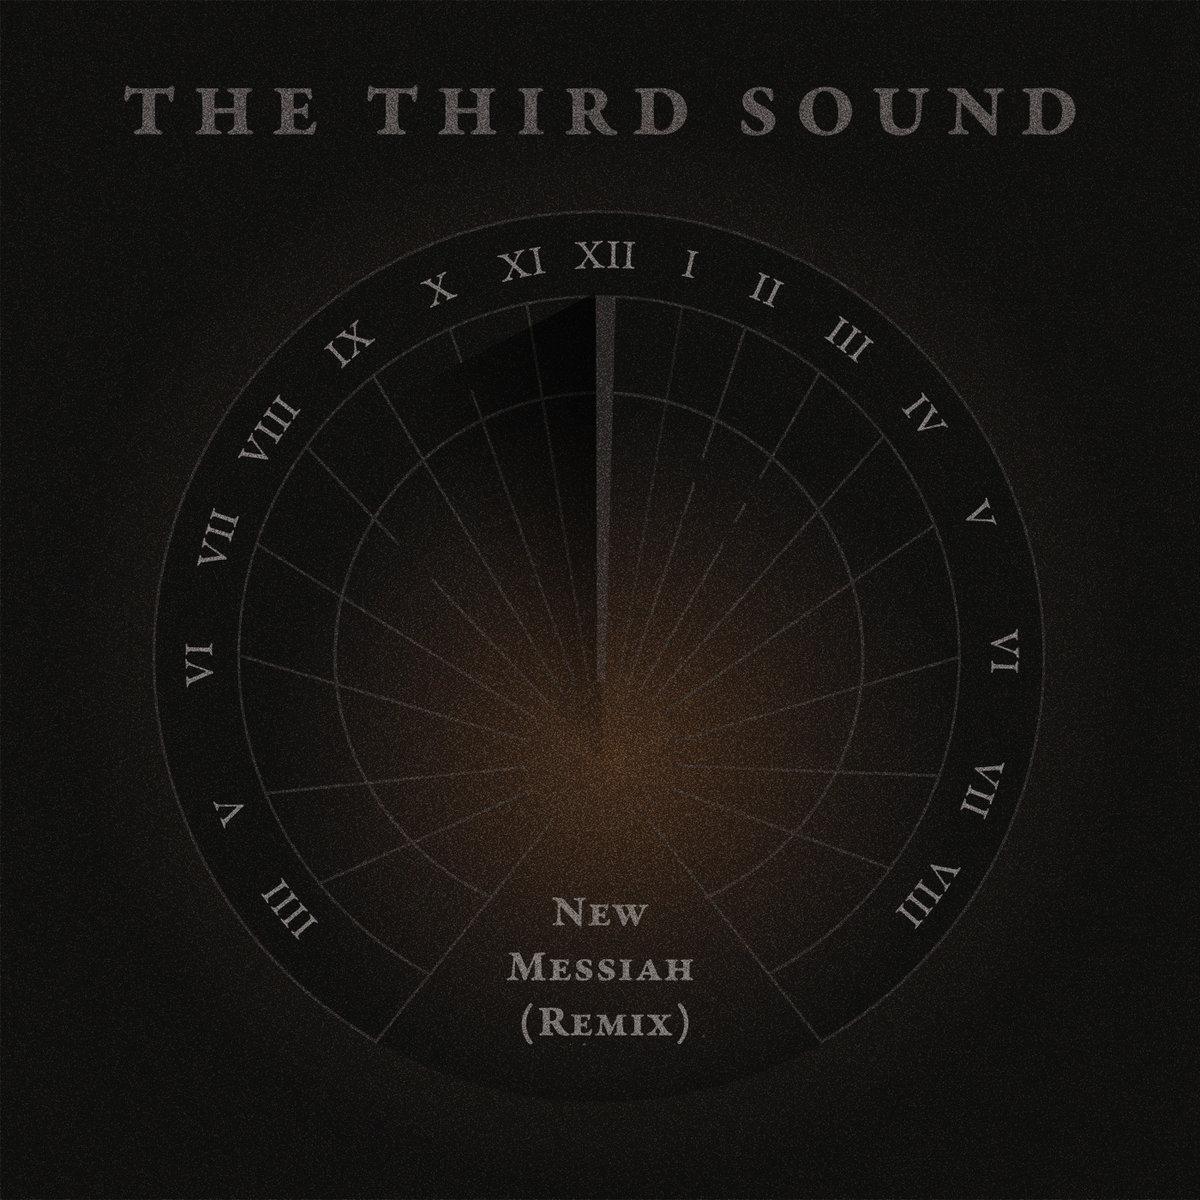 New Messiah (Remix)   The Third Sound